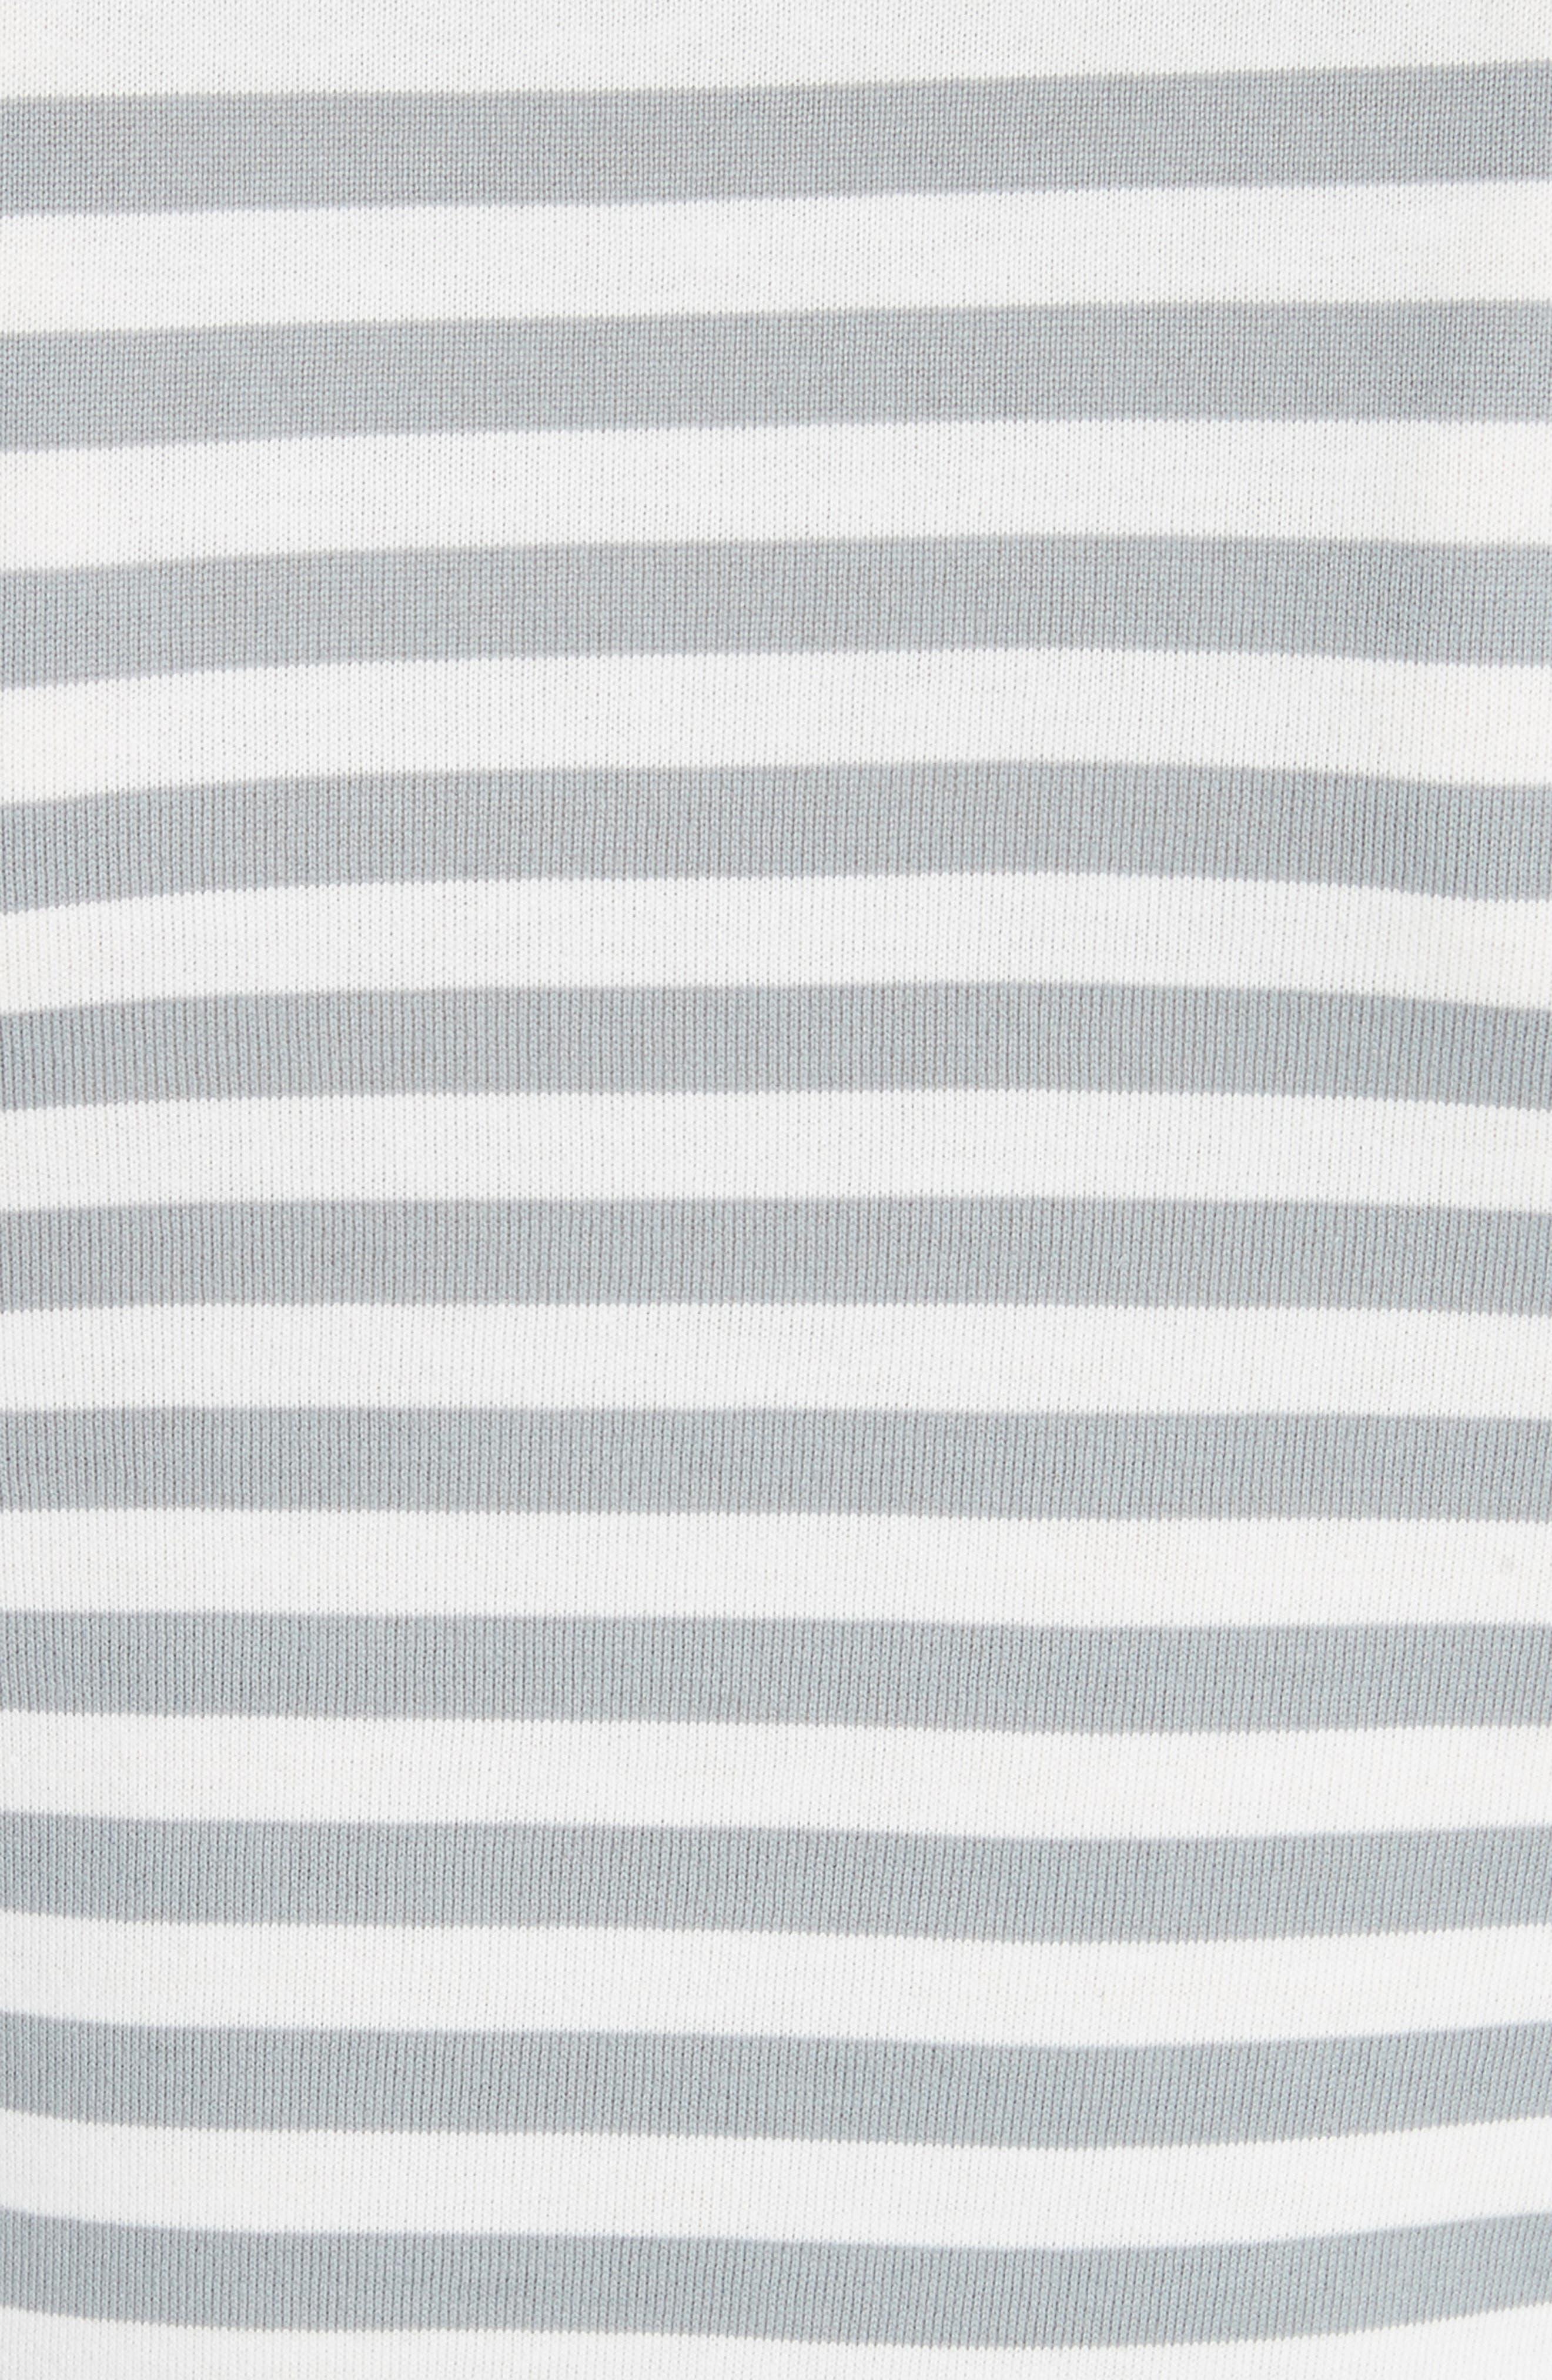 PLAY Stripe Tee,                             Alternate thumbnail 5, color,                             GREY